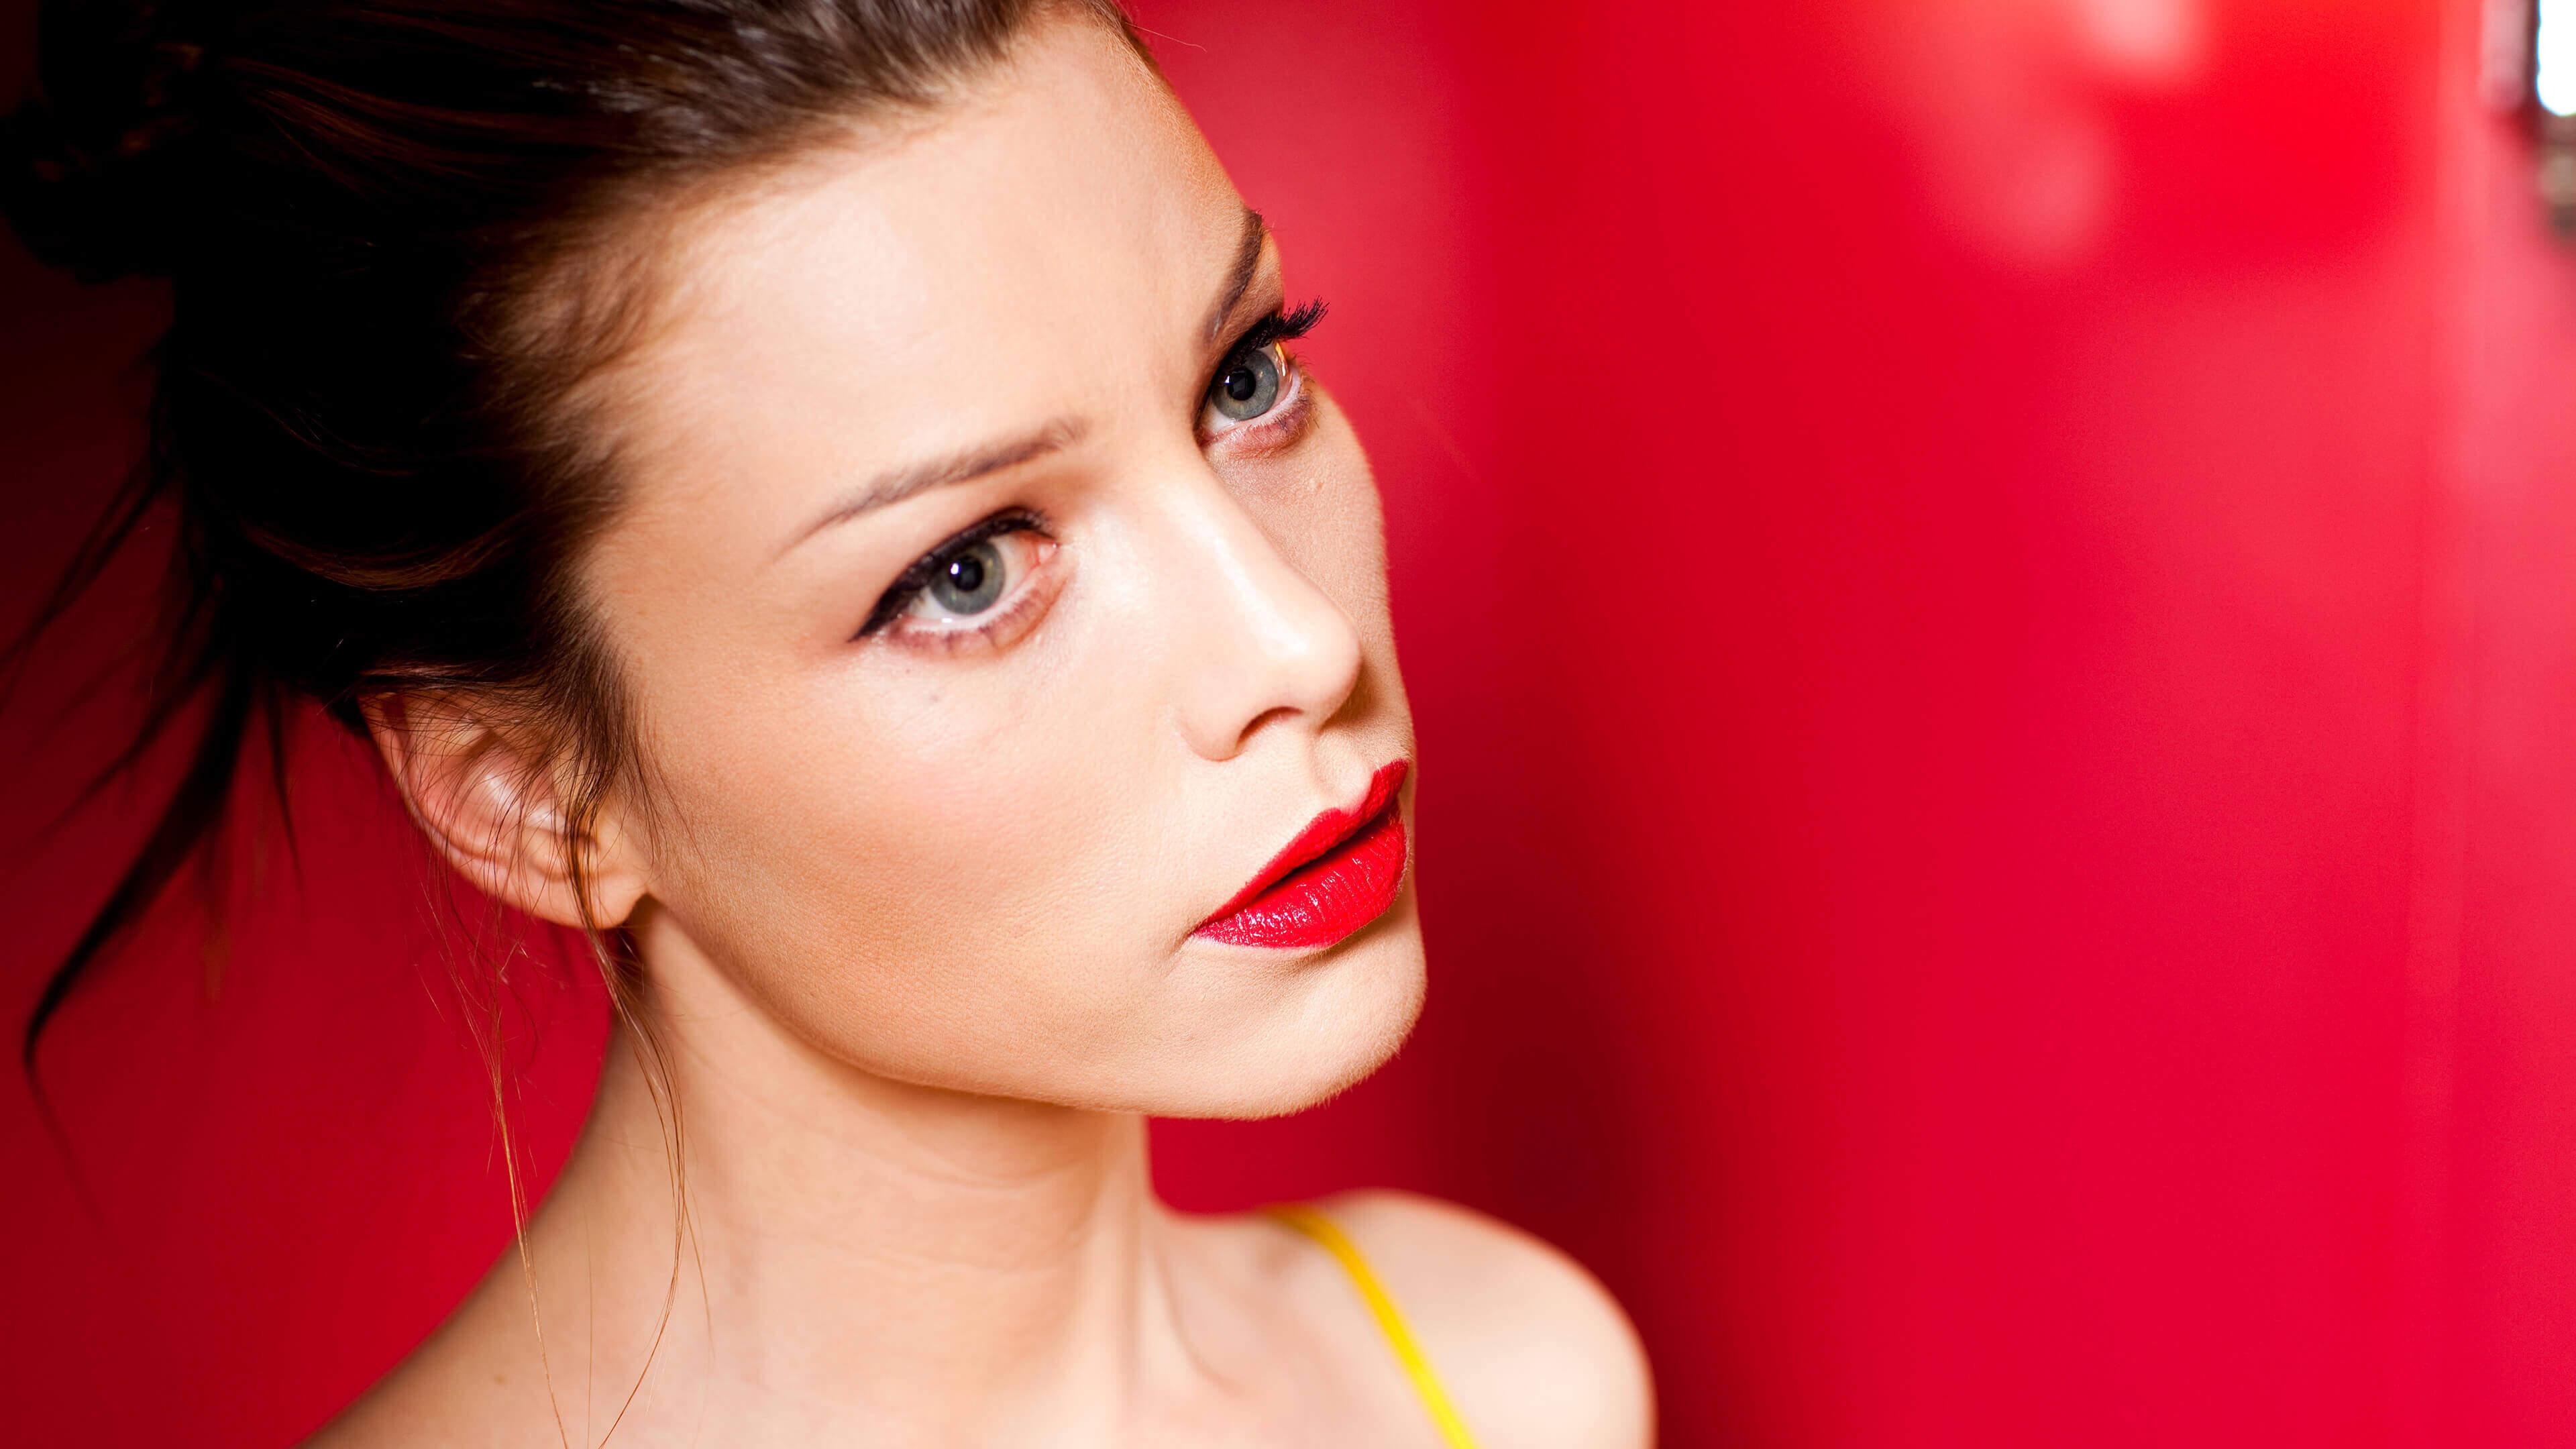 2932x2932 Pubg Android Game 4k Ipad Pro Retina Display Hd: Lauren German Lucifer Actress, HD 4K Wallpaper